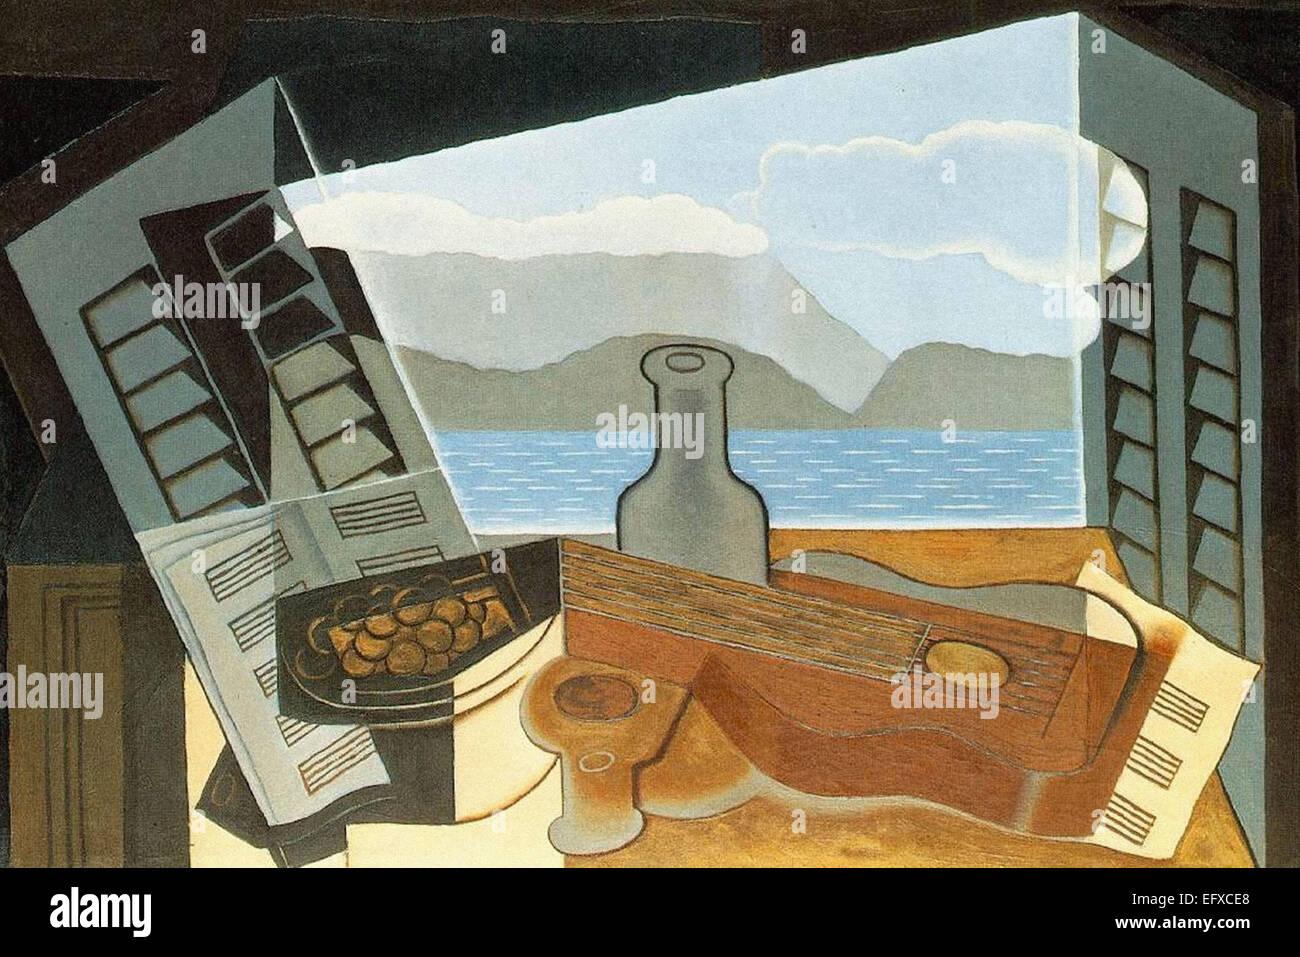 Juan Gris la ventana abierta Imagen De Stock